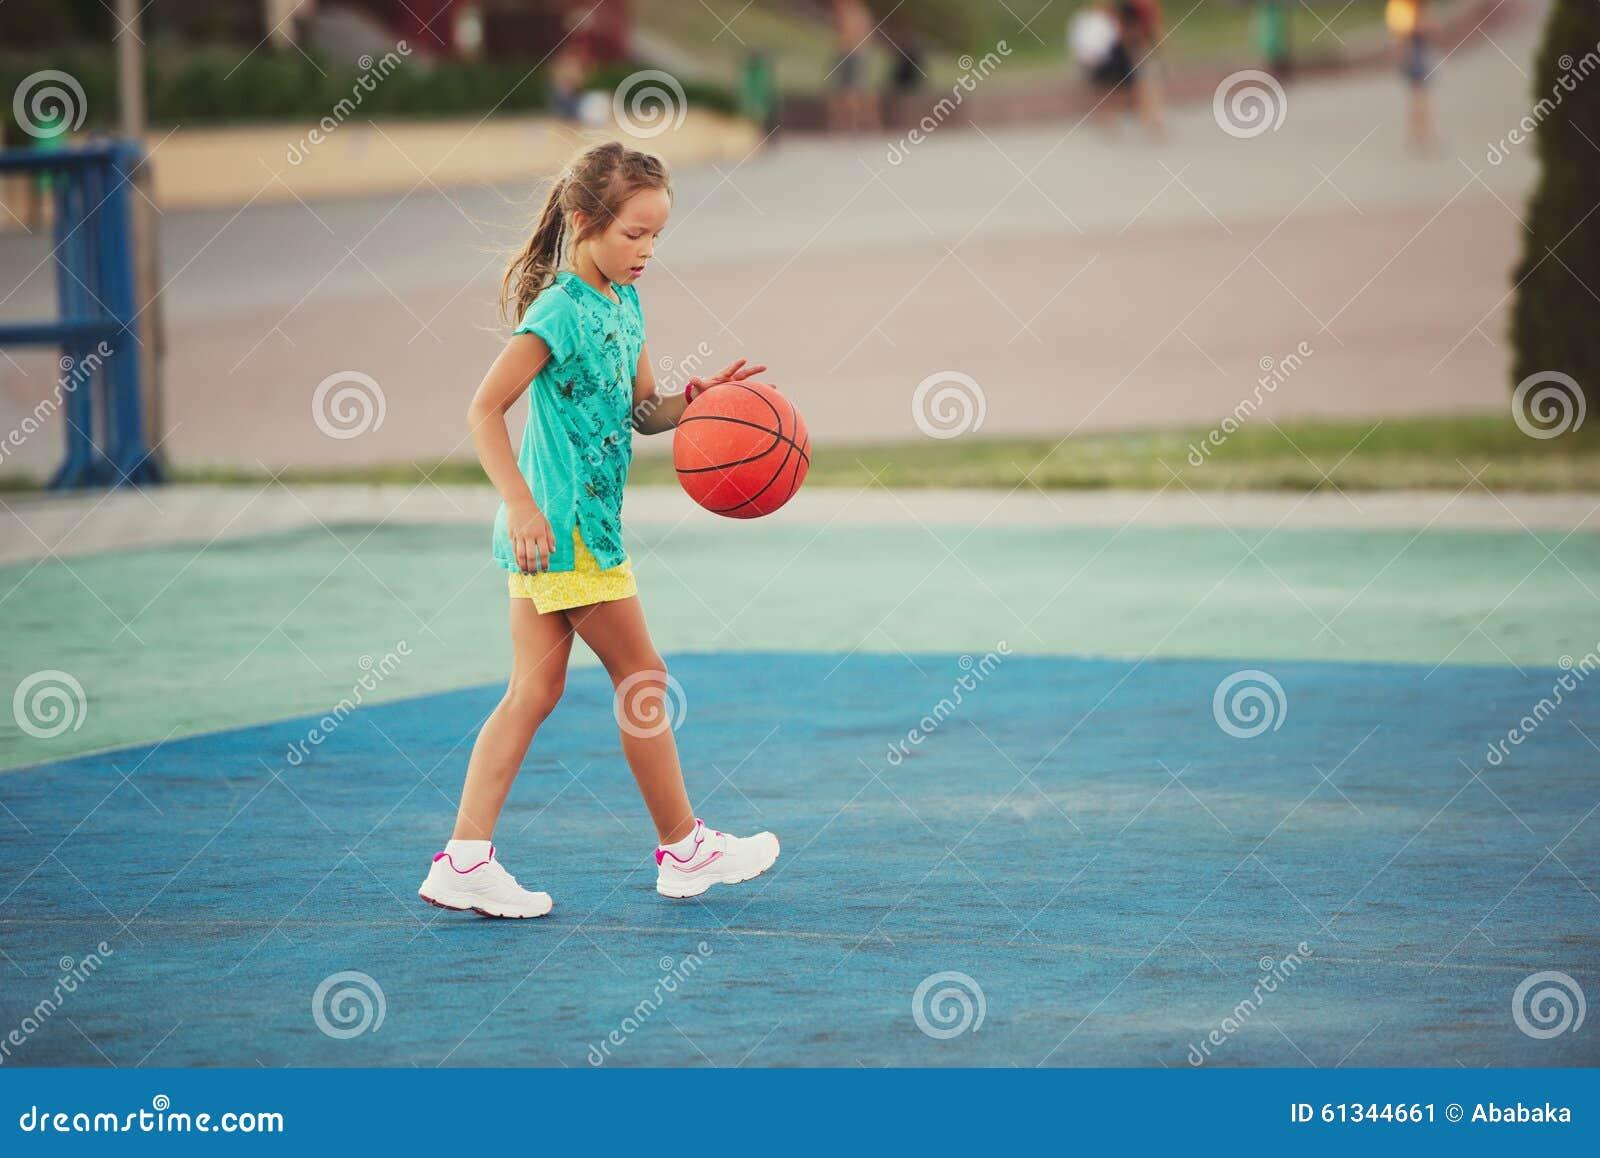 A Woman Playing Basketball Imágenes De Stock A Woman: Little Cute Girl Playing Basketball Outdoors Stock Photo